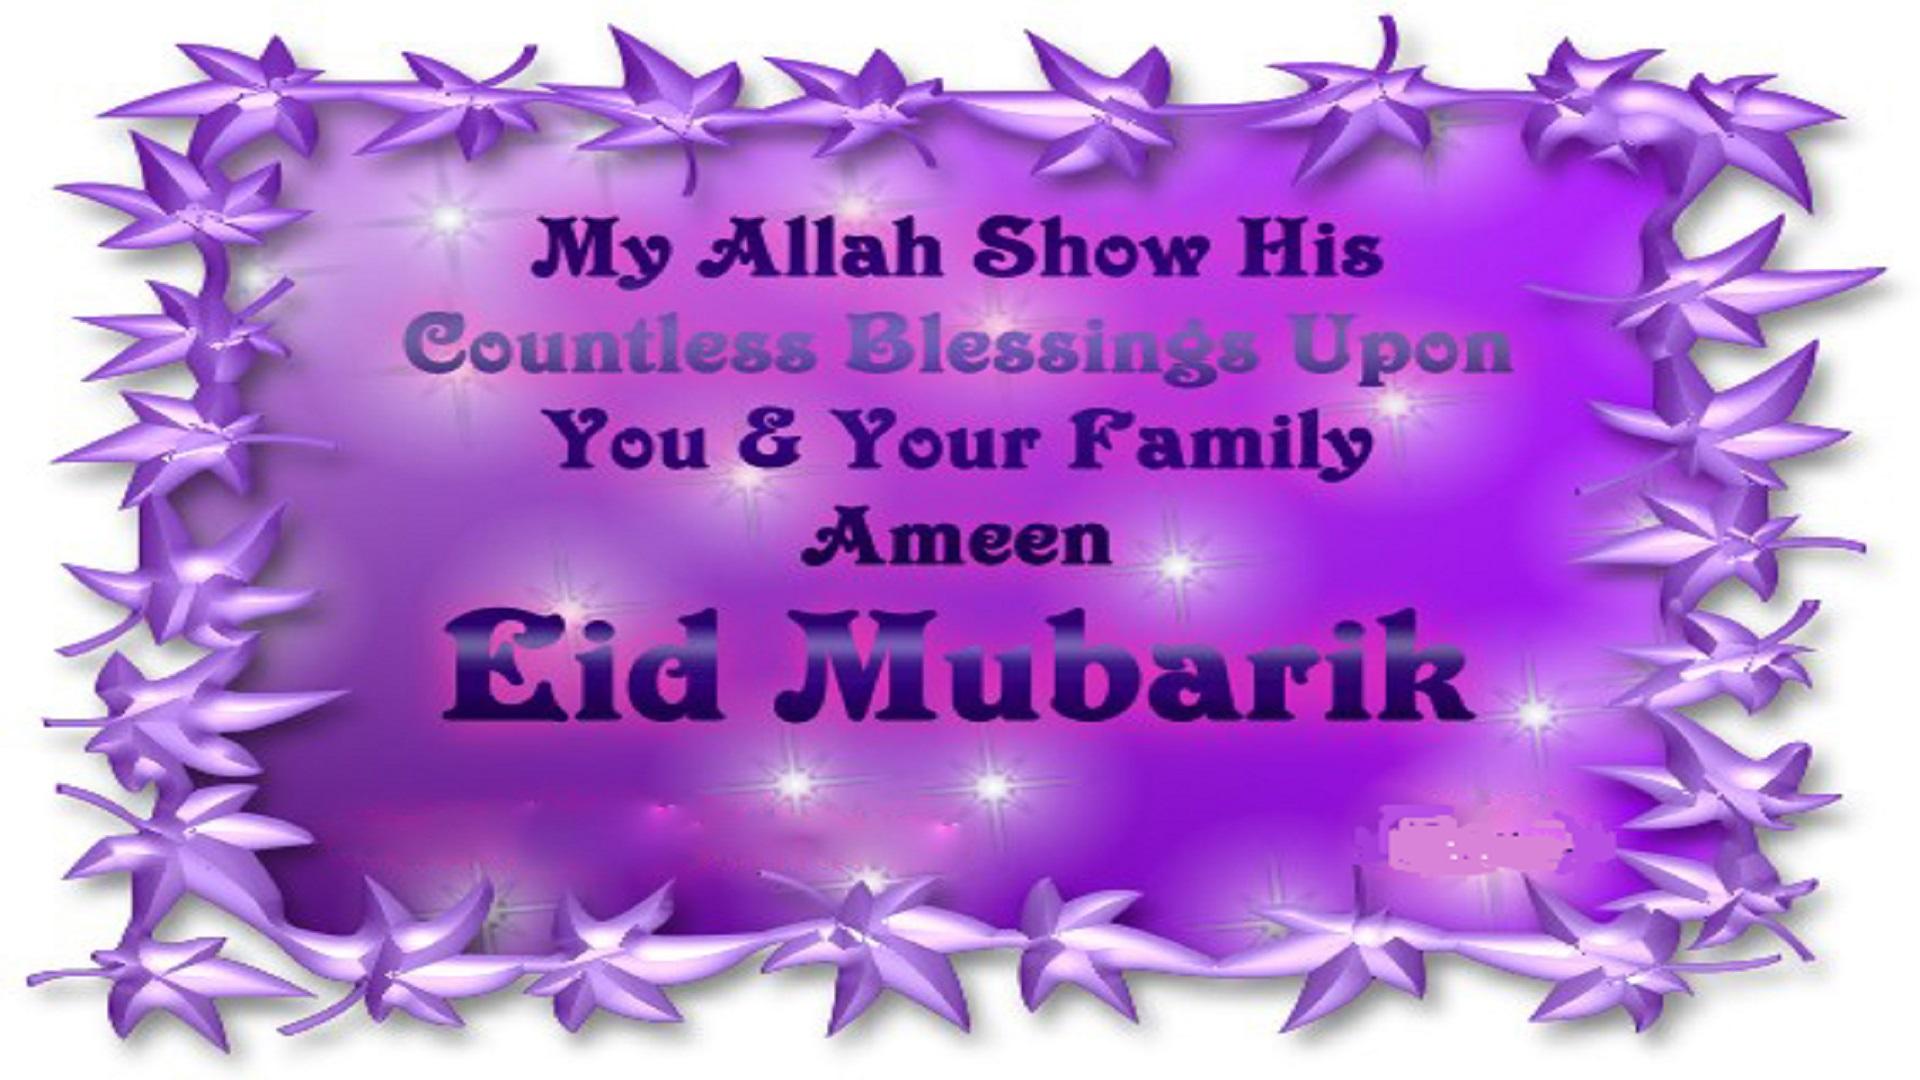 Eid Special Free Hd Wallpapers Eid Mubarik Hd Wallpaper